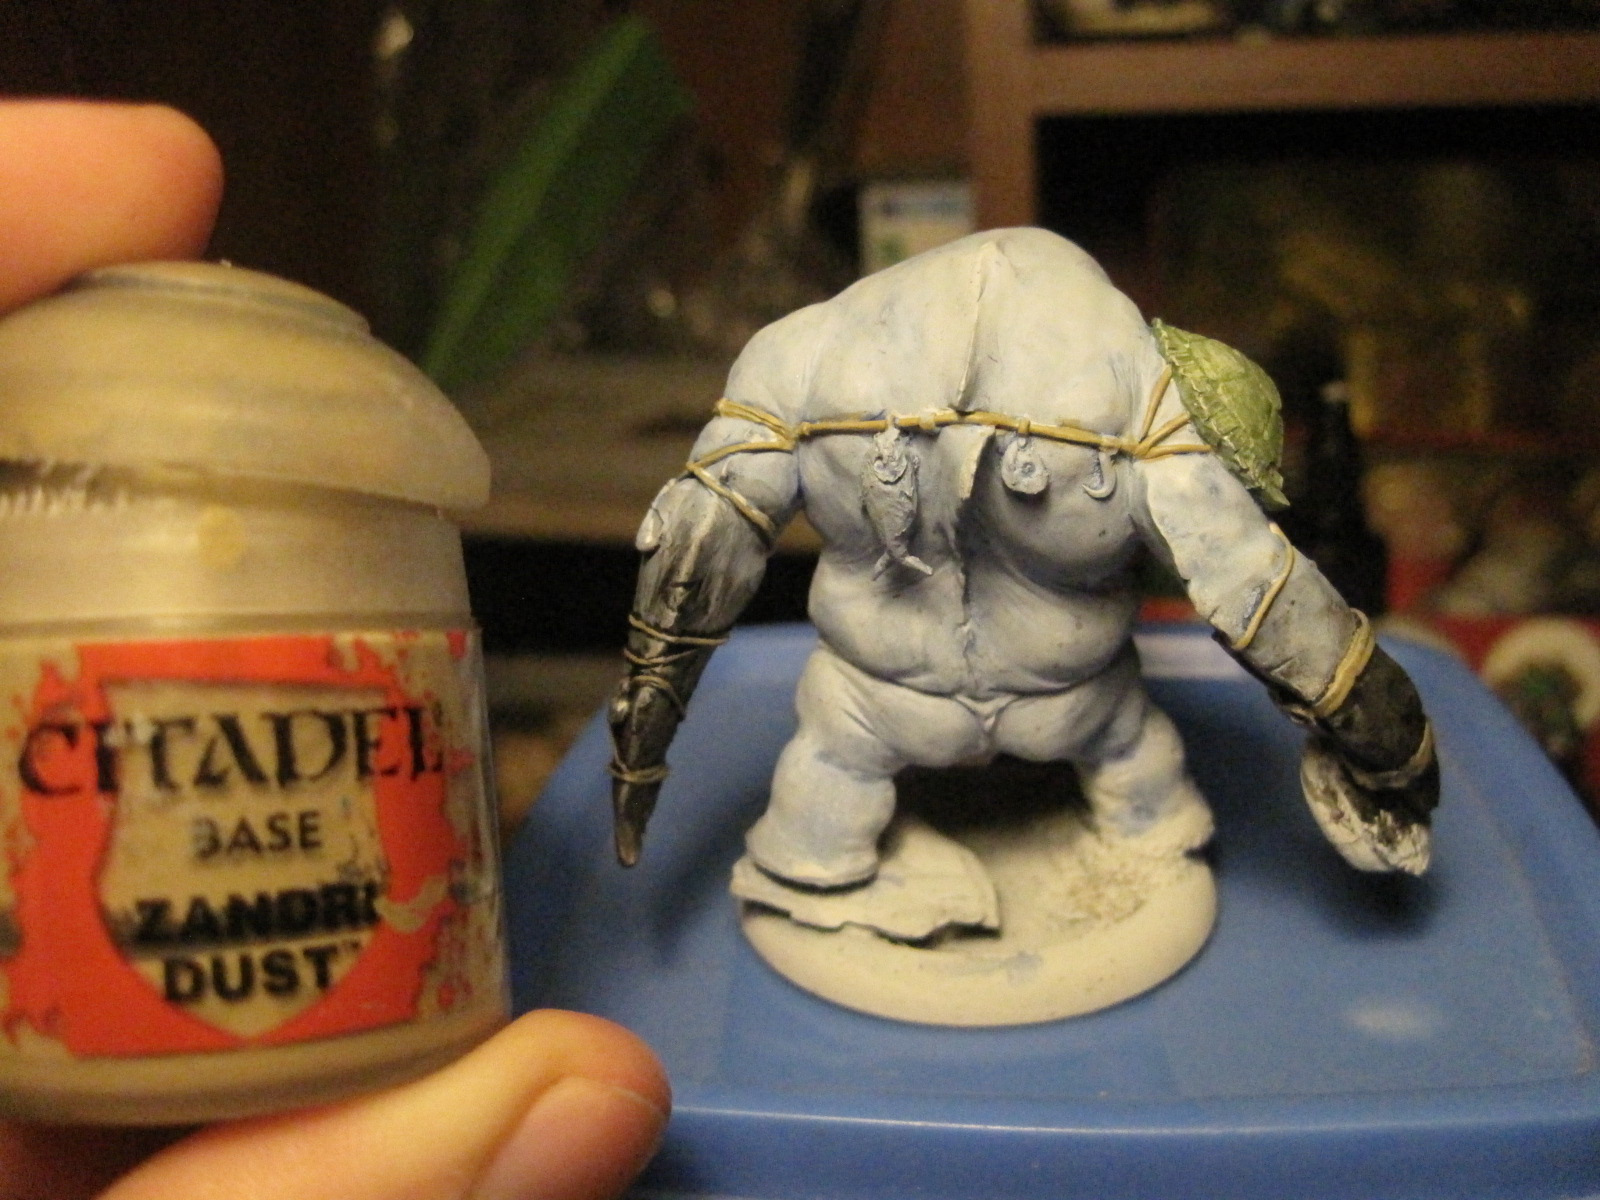 zandri dust whale troll